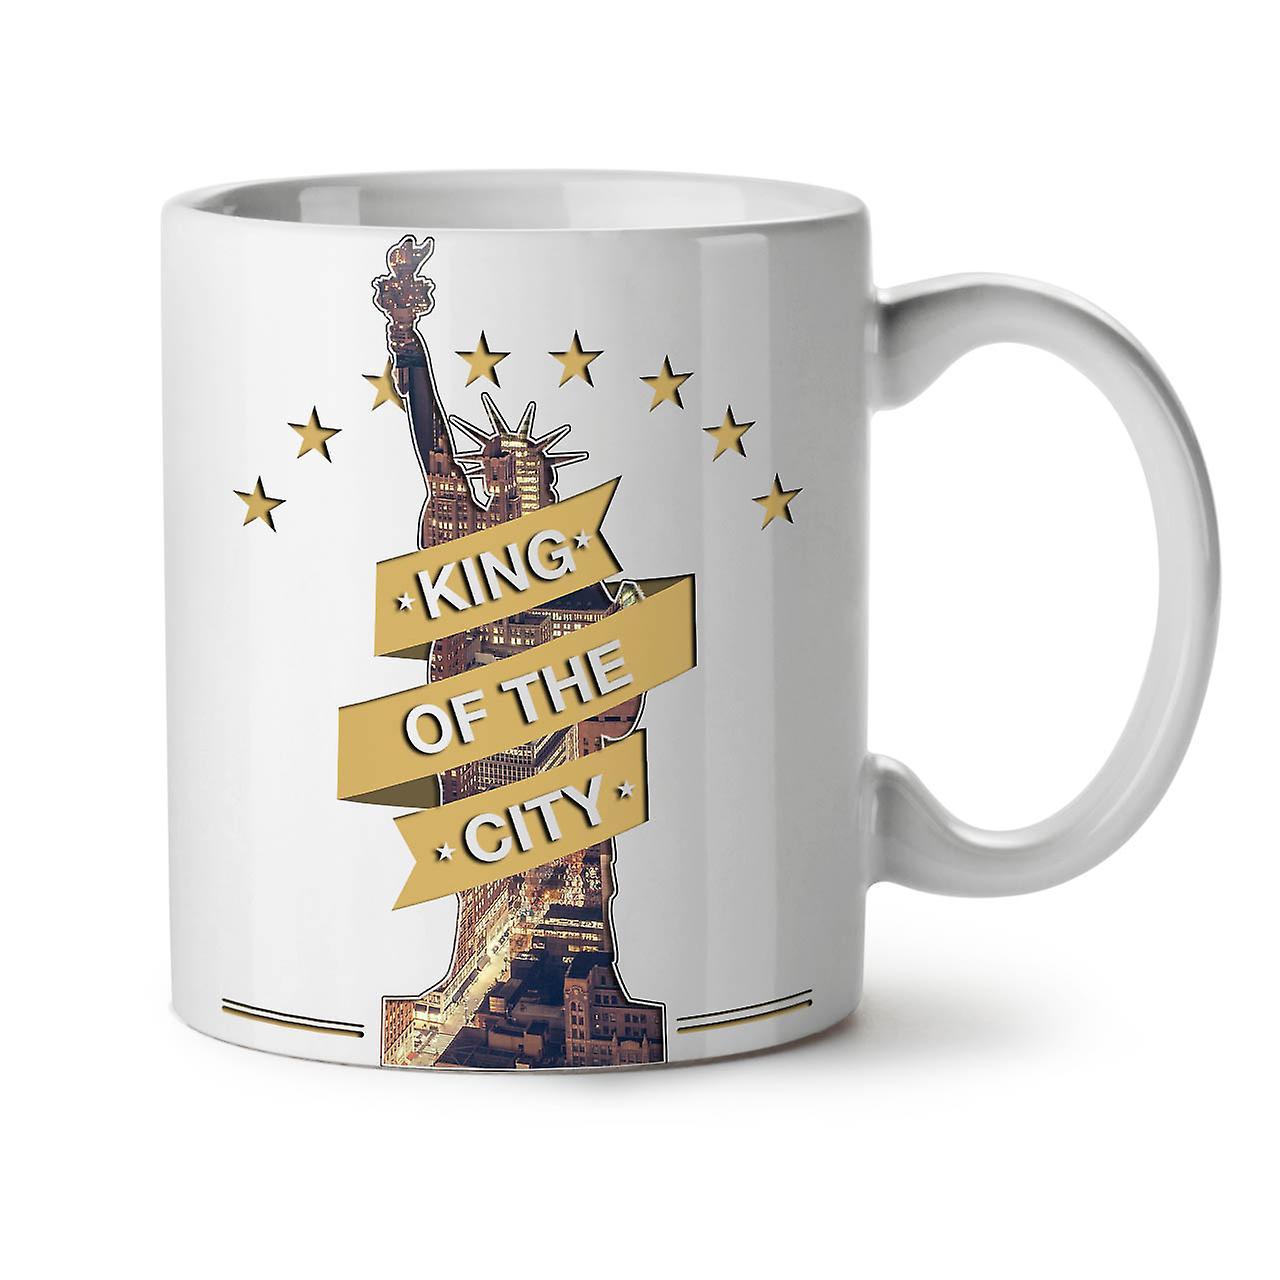 City Ceramic Freedom New 11 Tea Mug Coffee Statue OzWellcoda White uXZOPTwki